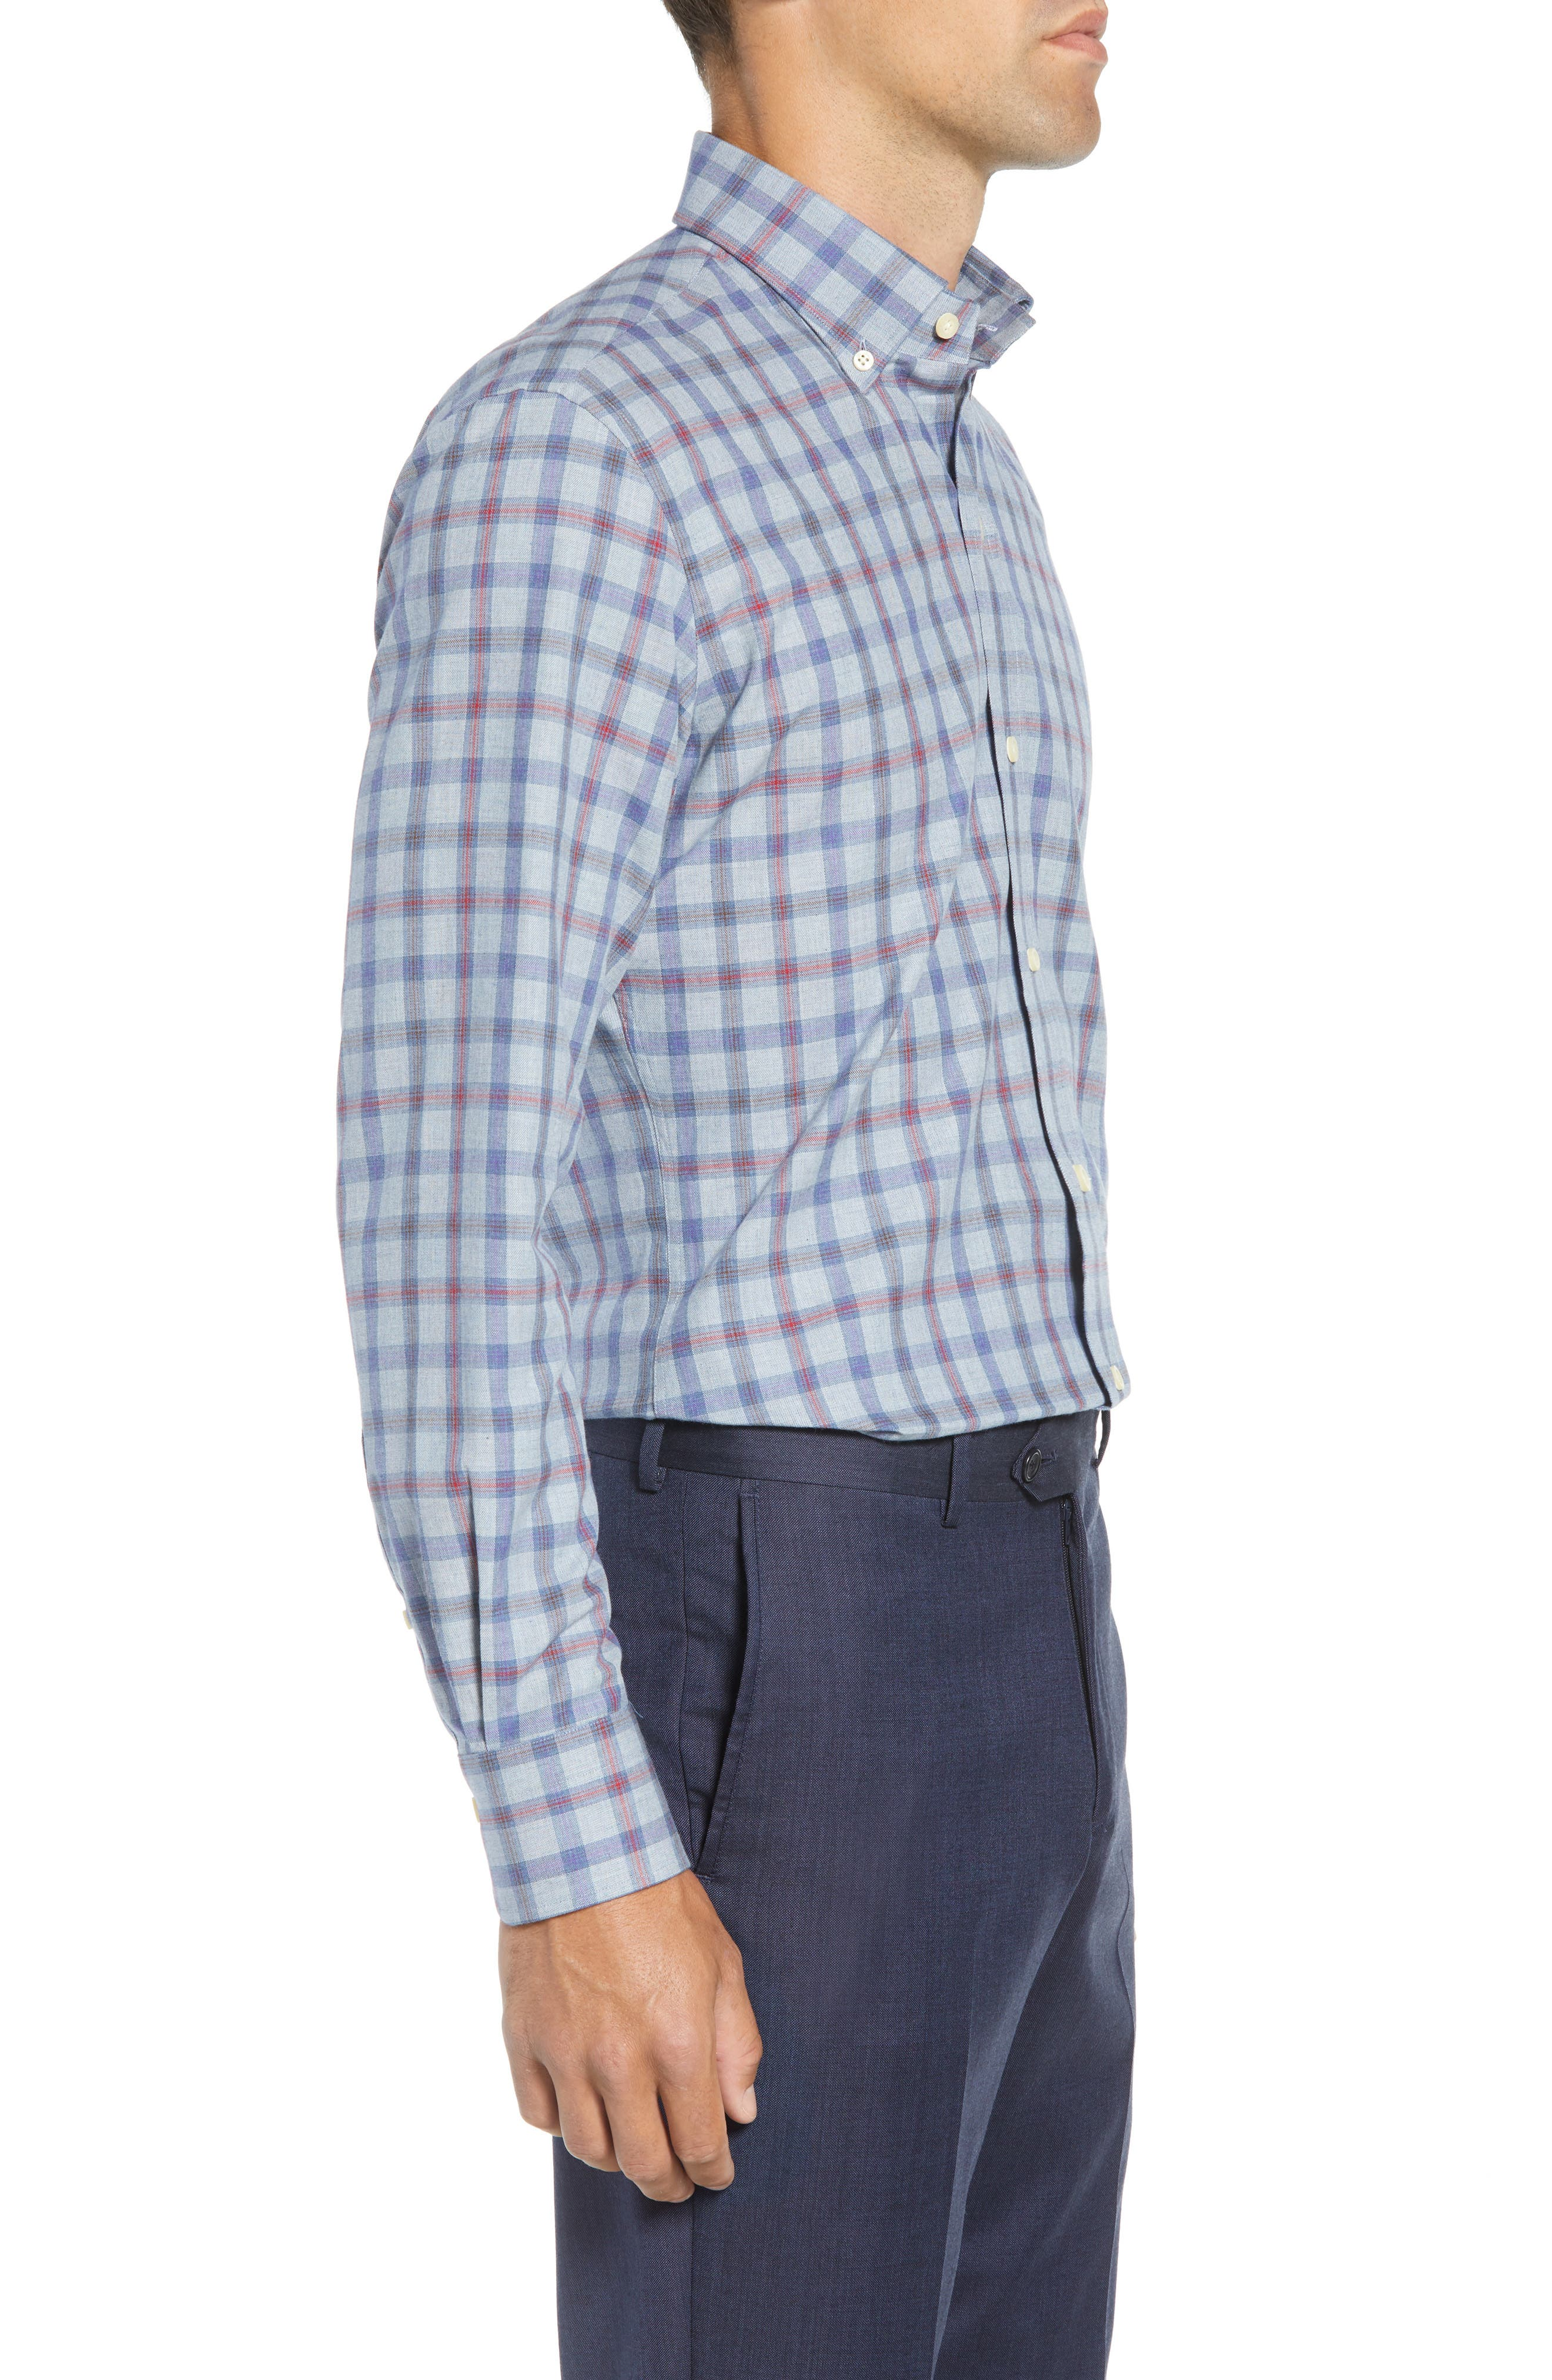 Hilbank Trim Fit Check Dress Shirt,                             Alternate thumbnail 4, color,                             CADET BLUE